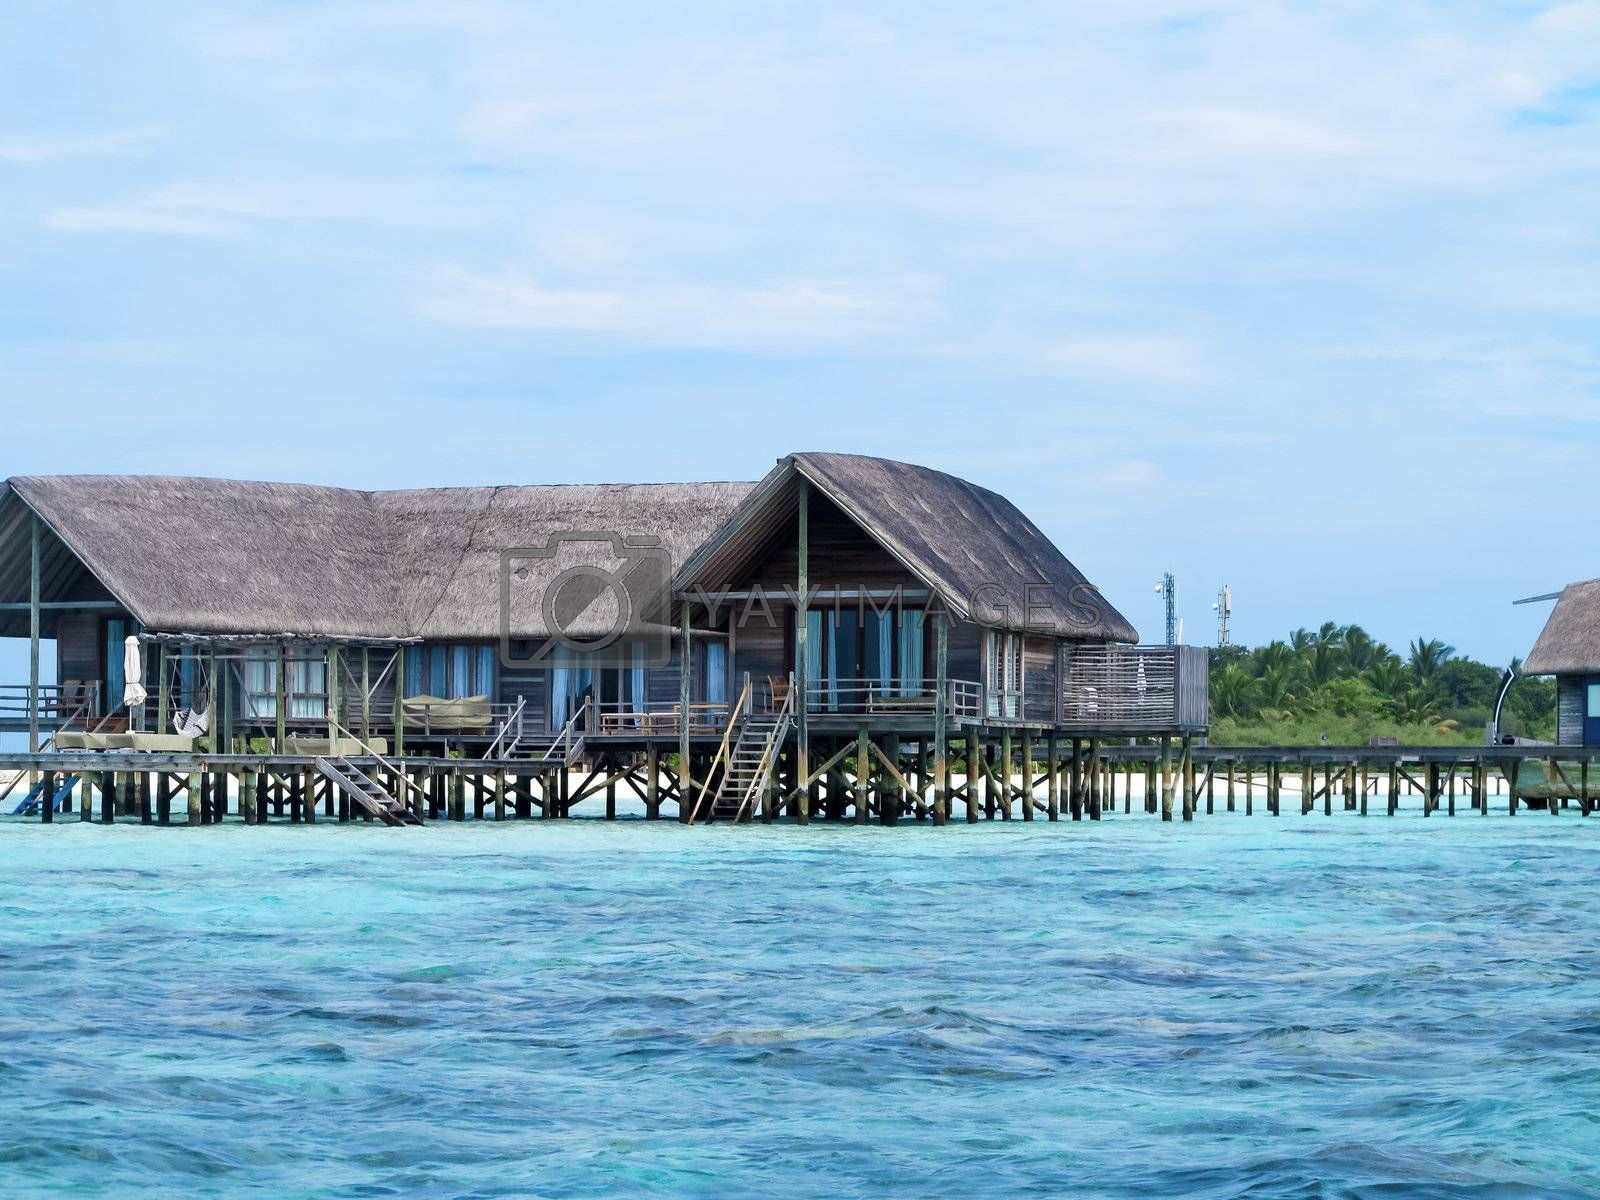 Isolation of a cottage facing towards sea on beautiful maldive island.